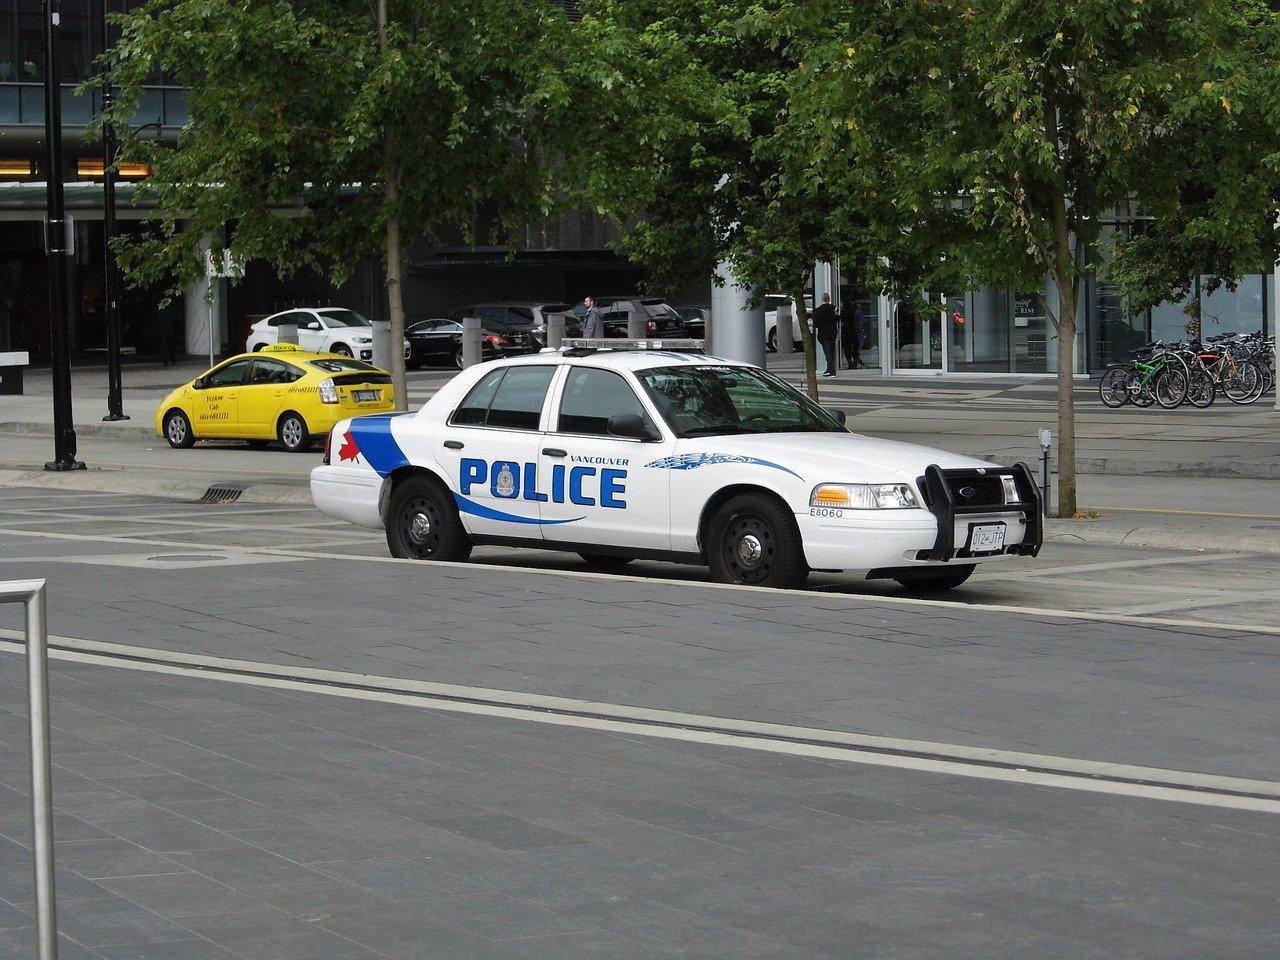 Policie Kanada